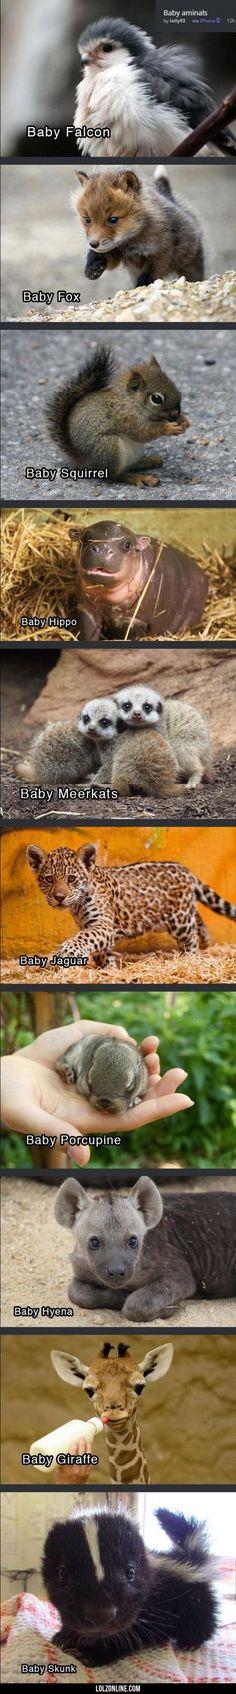 Bebes! #lol #lolzonline